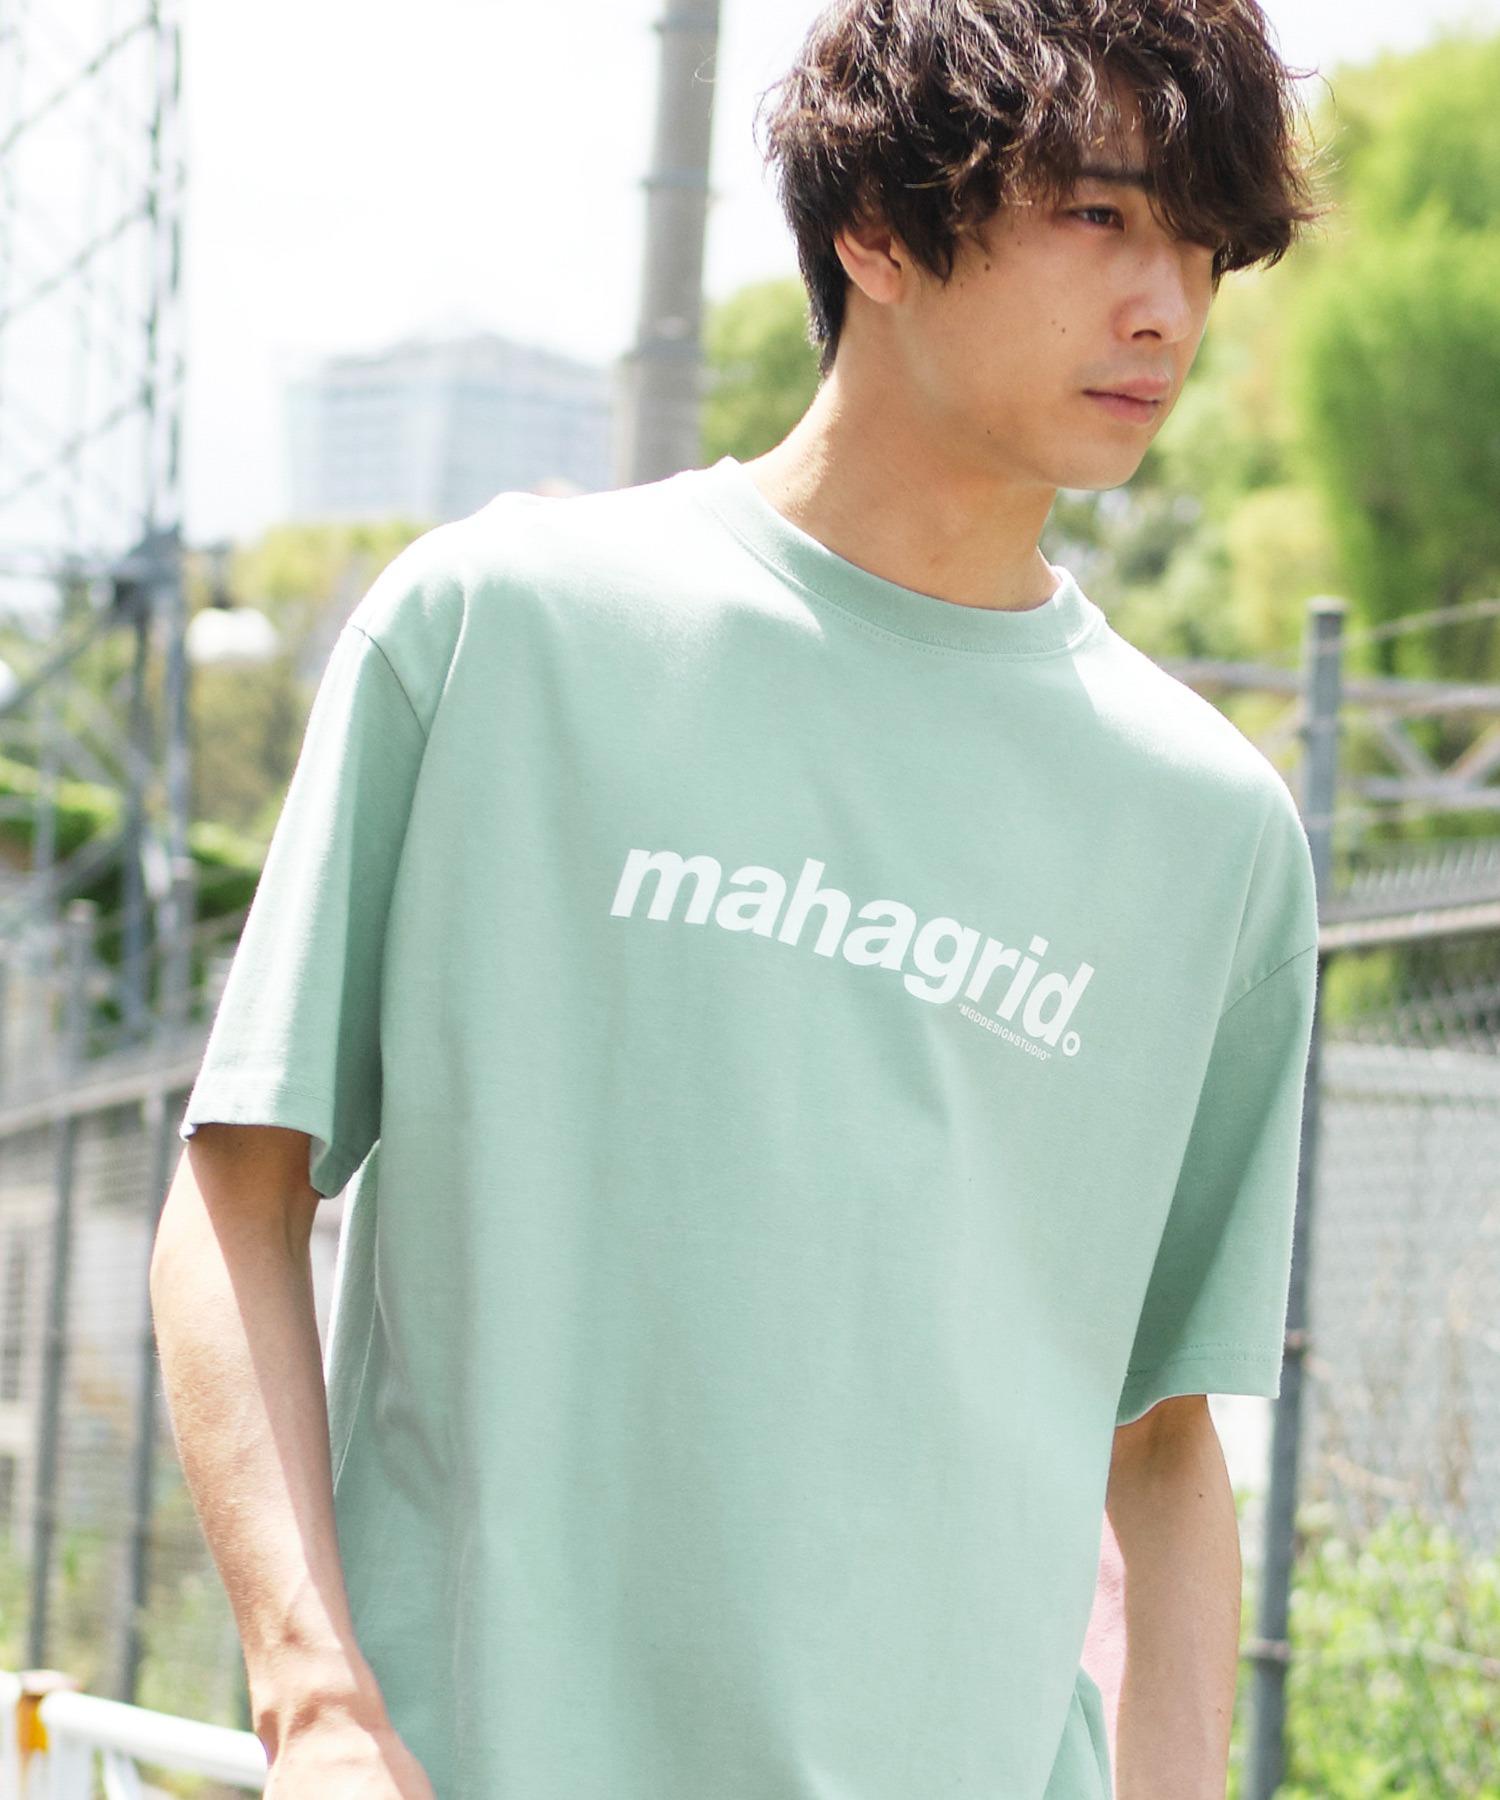 MAHAGRID/マハグリッド THIRD LOGO/BASIC LOGO  ロゴプリントオーバーサイズ半袖カットソー